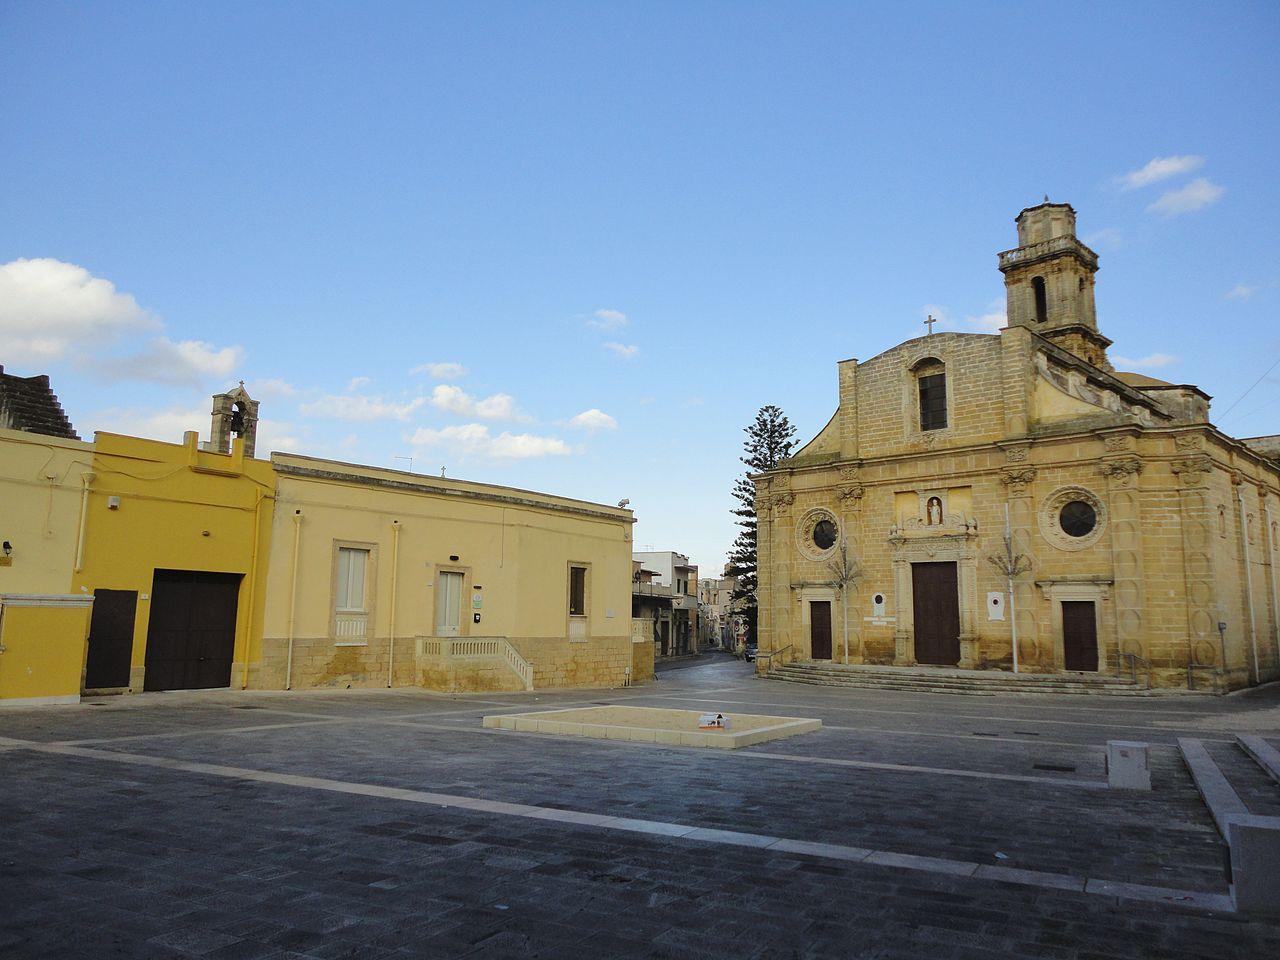 1280px-Piazza_San_Nicola_Squinzano